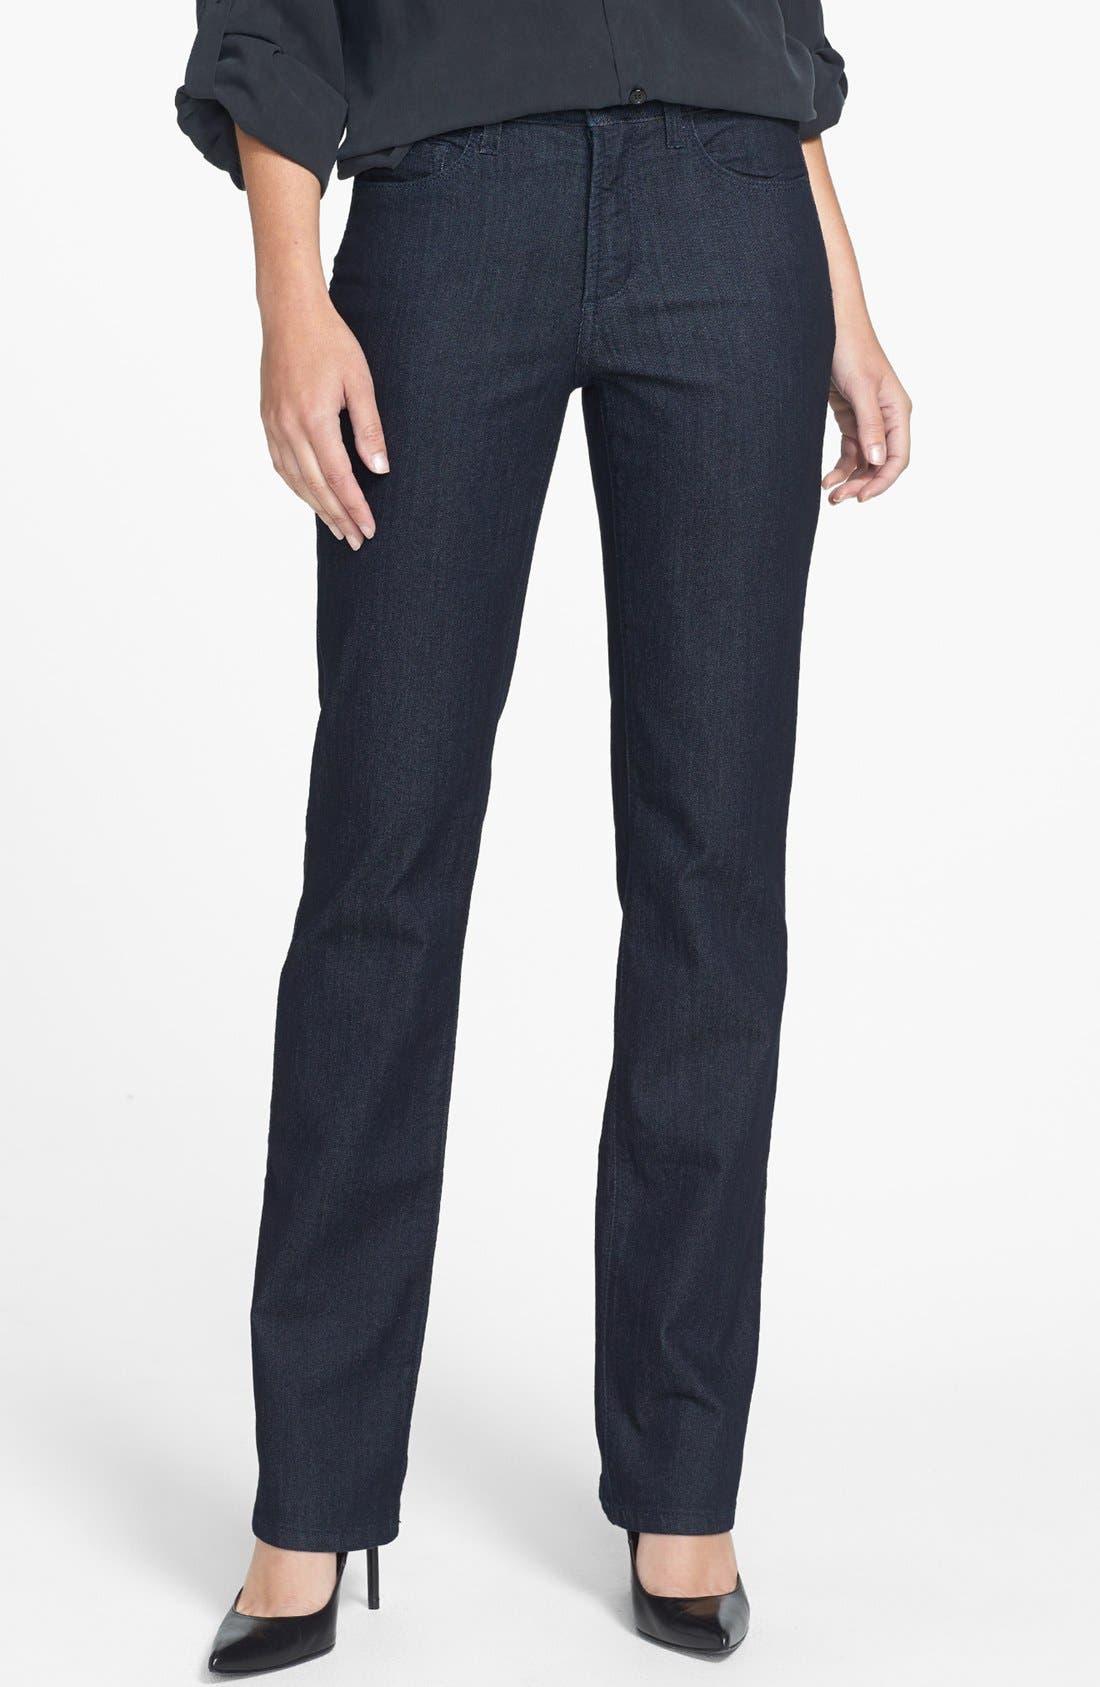 Alternate Image 1 Selected - NYDJ 'Marilyn' Embellished Pocket Stretch Straight Leg Jeans